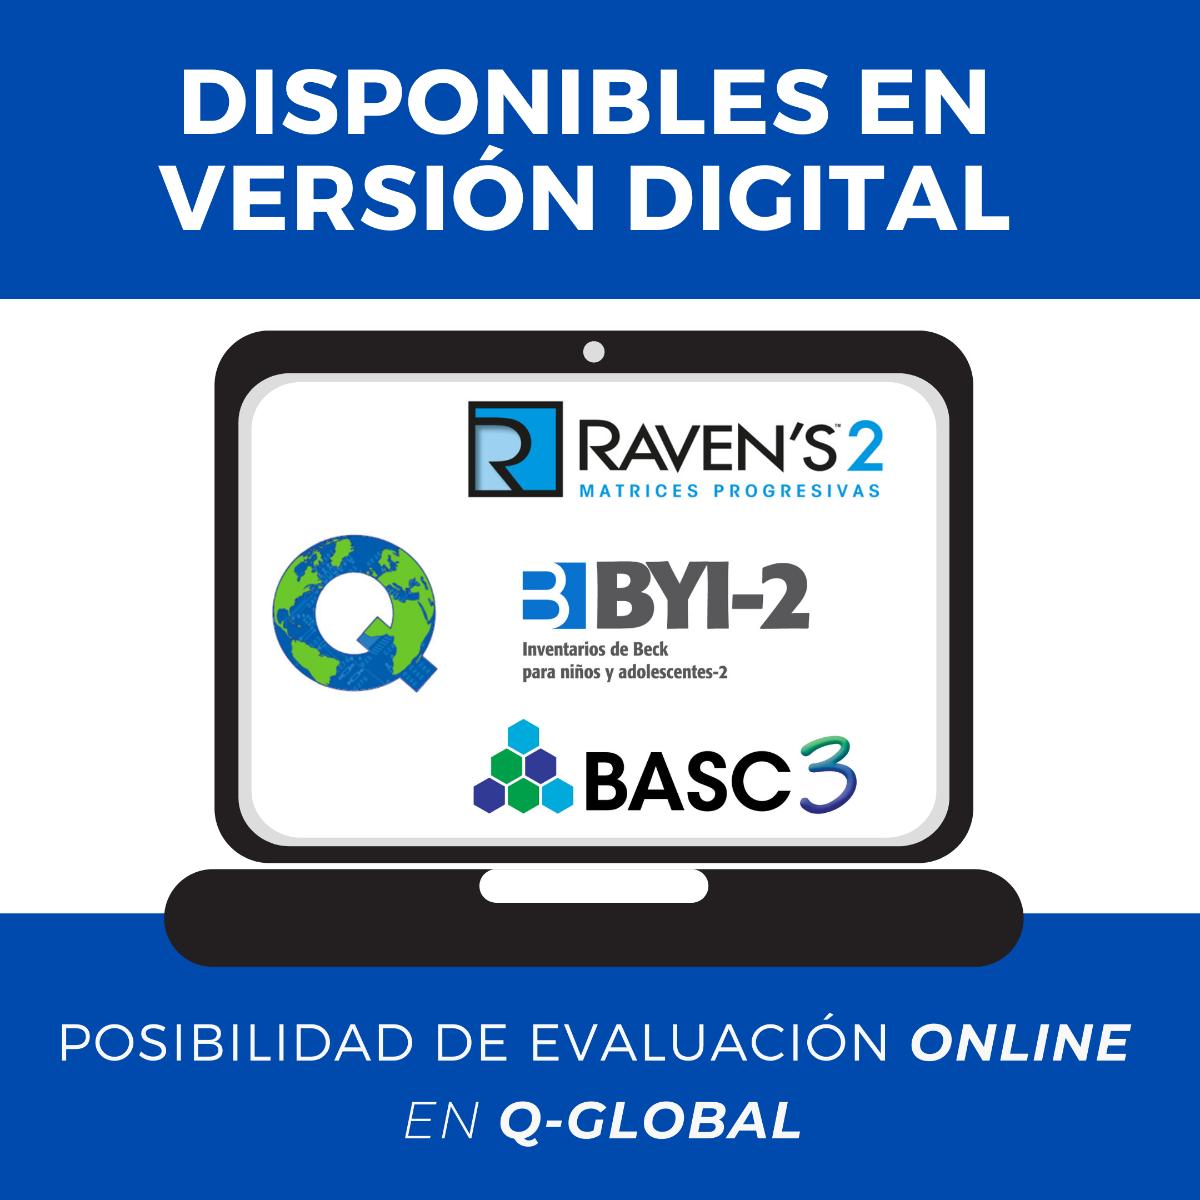 Raven_s_2_BASC3_BYI2_evaluaci_n_online_Qglobal